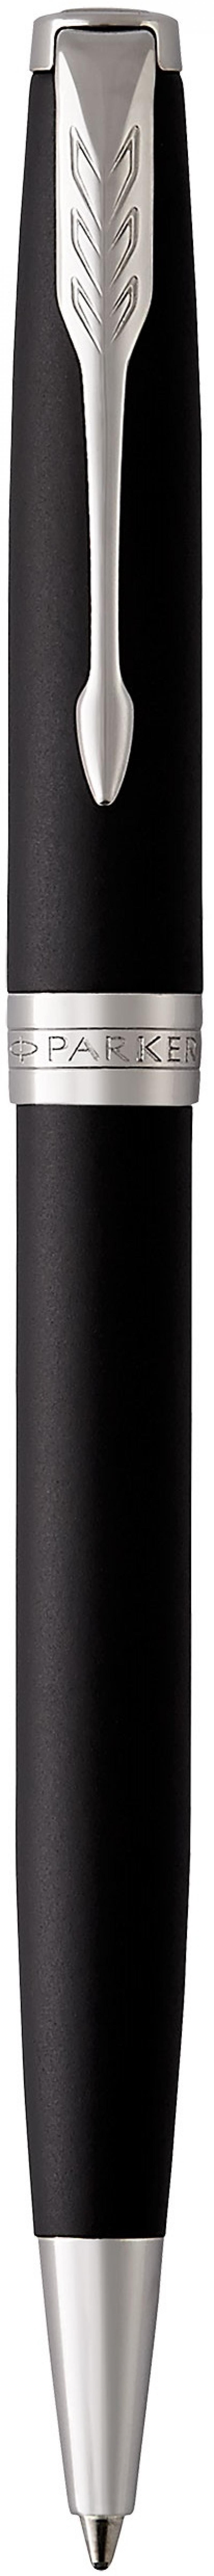 Шариковая ручка поворотная Parker Sonnet Core K529 Matte Black CT черный M 1931524 шариковая ручка поворотная parker sonnet core k527 stainless steel gt черный m 1931507